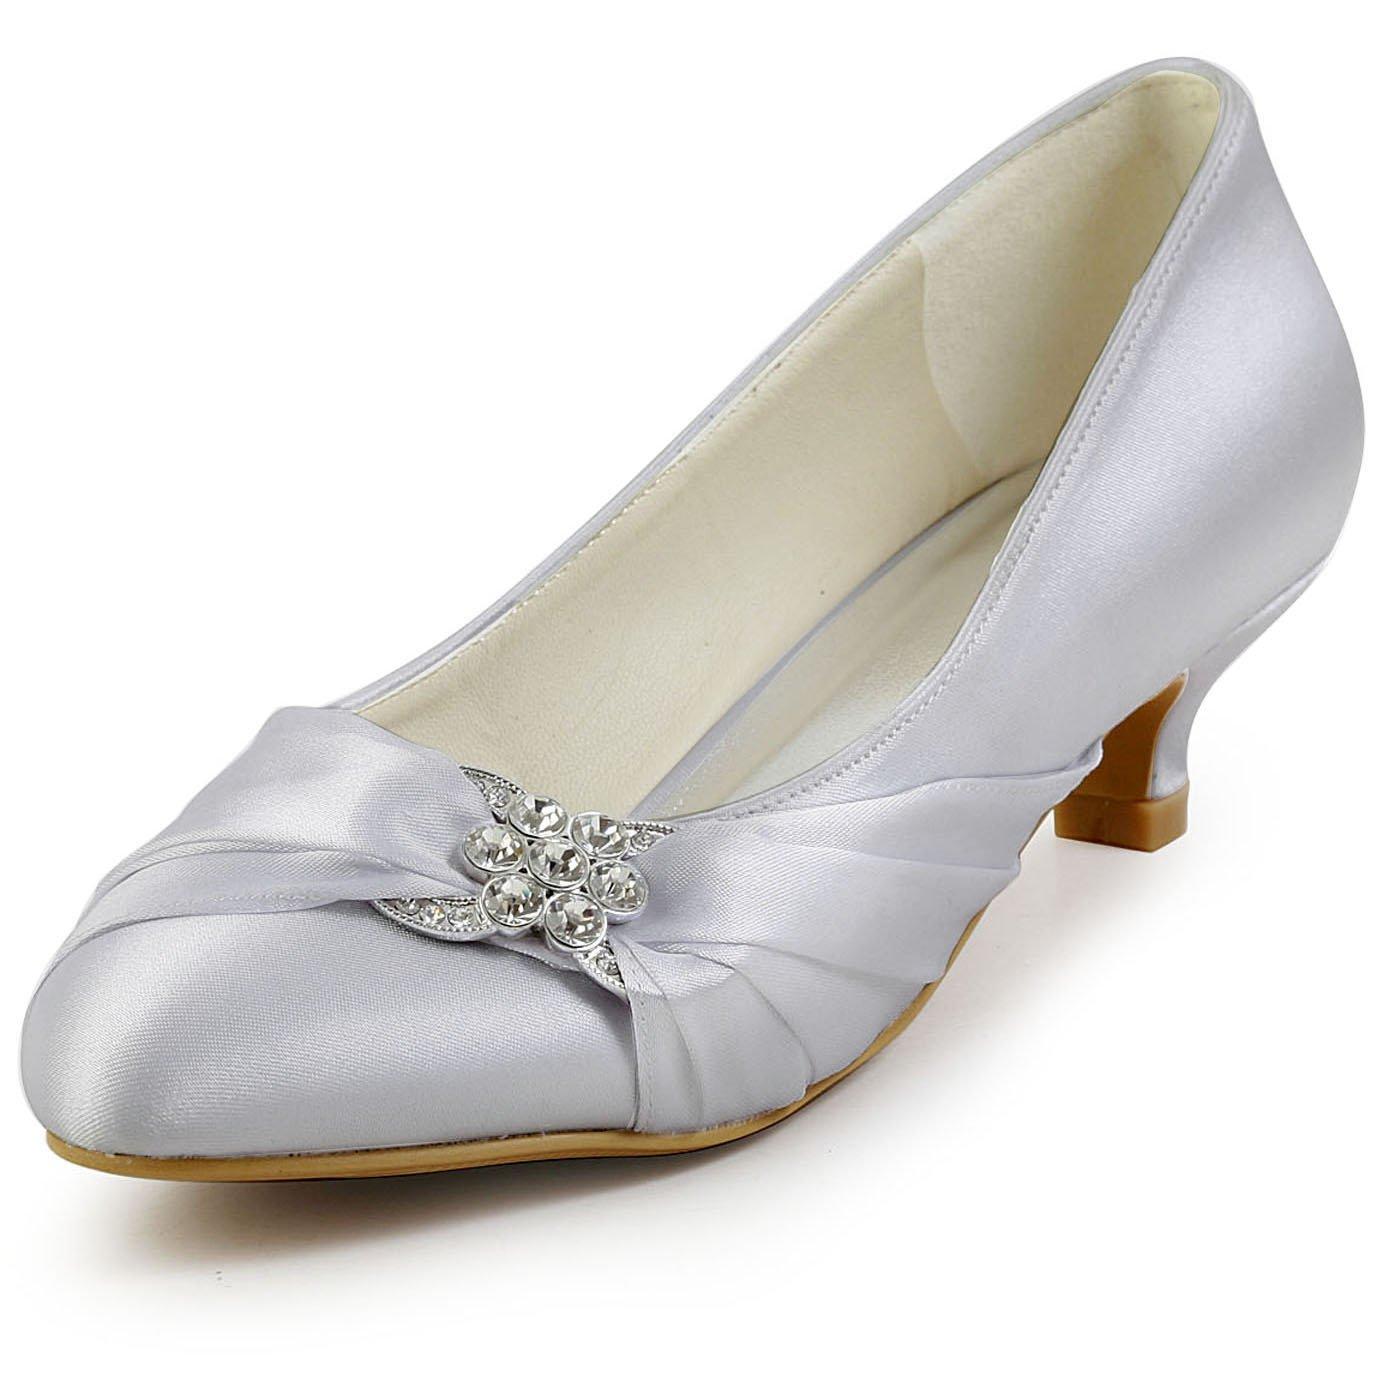 ElegantPark EP2006L Women Comfort Heel Closed Toe Rhinestone Satin Bridal Wedding Shoes Silver US 7 by ElegantPark